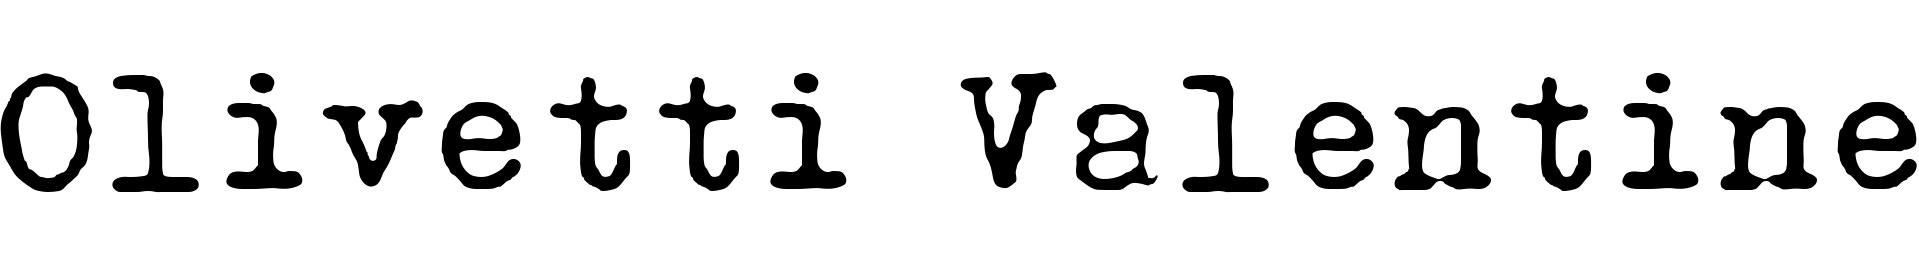 Olivetti Valentine